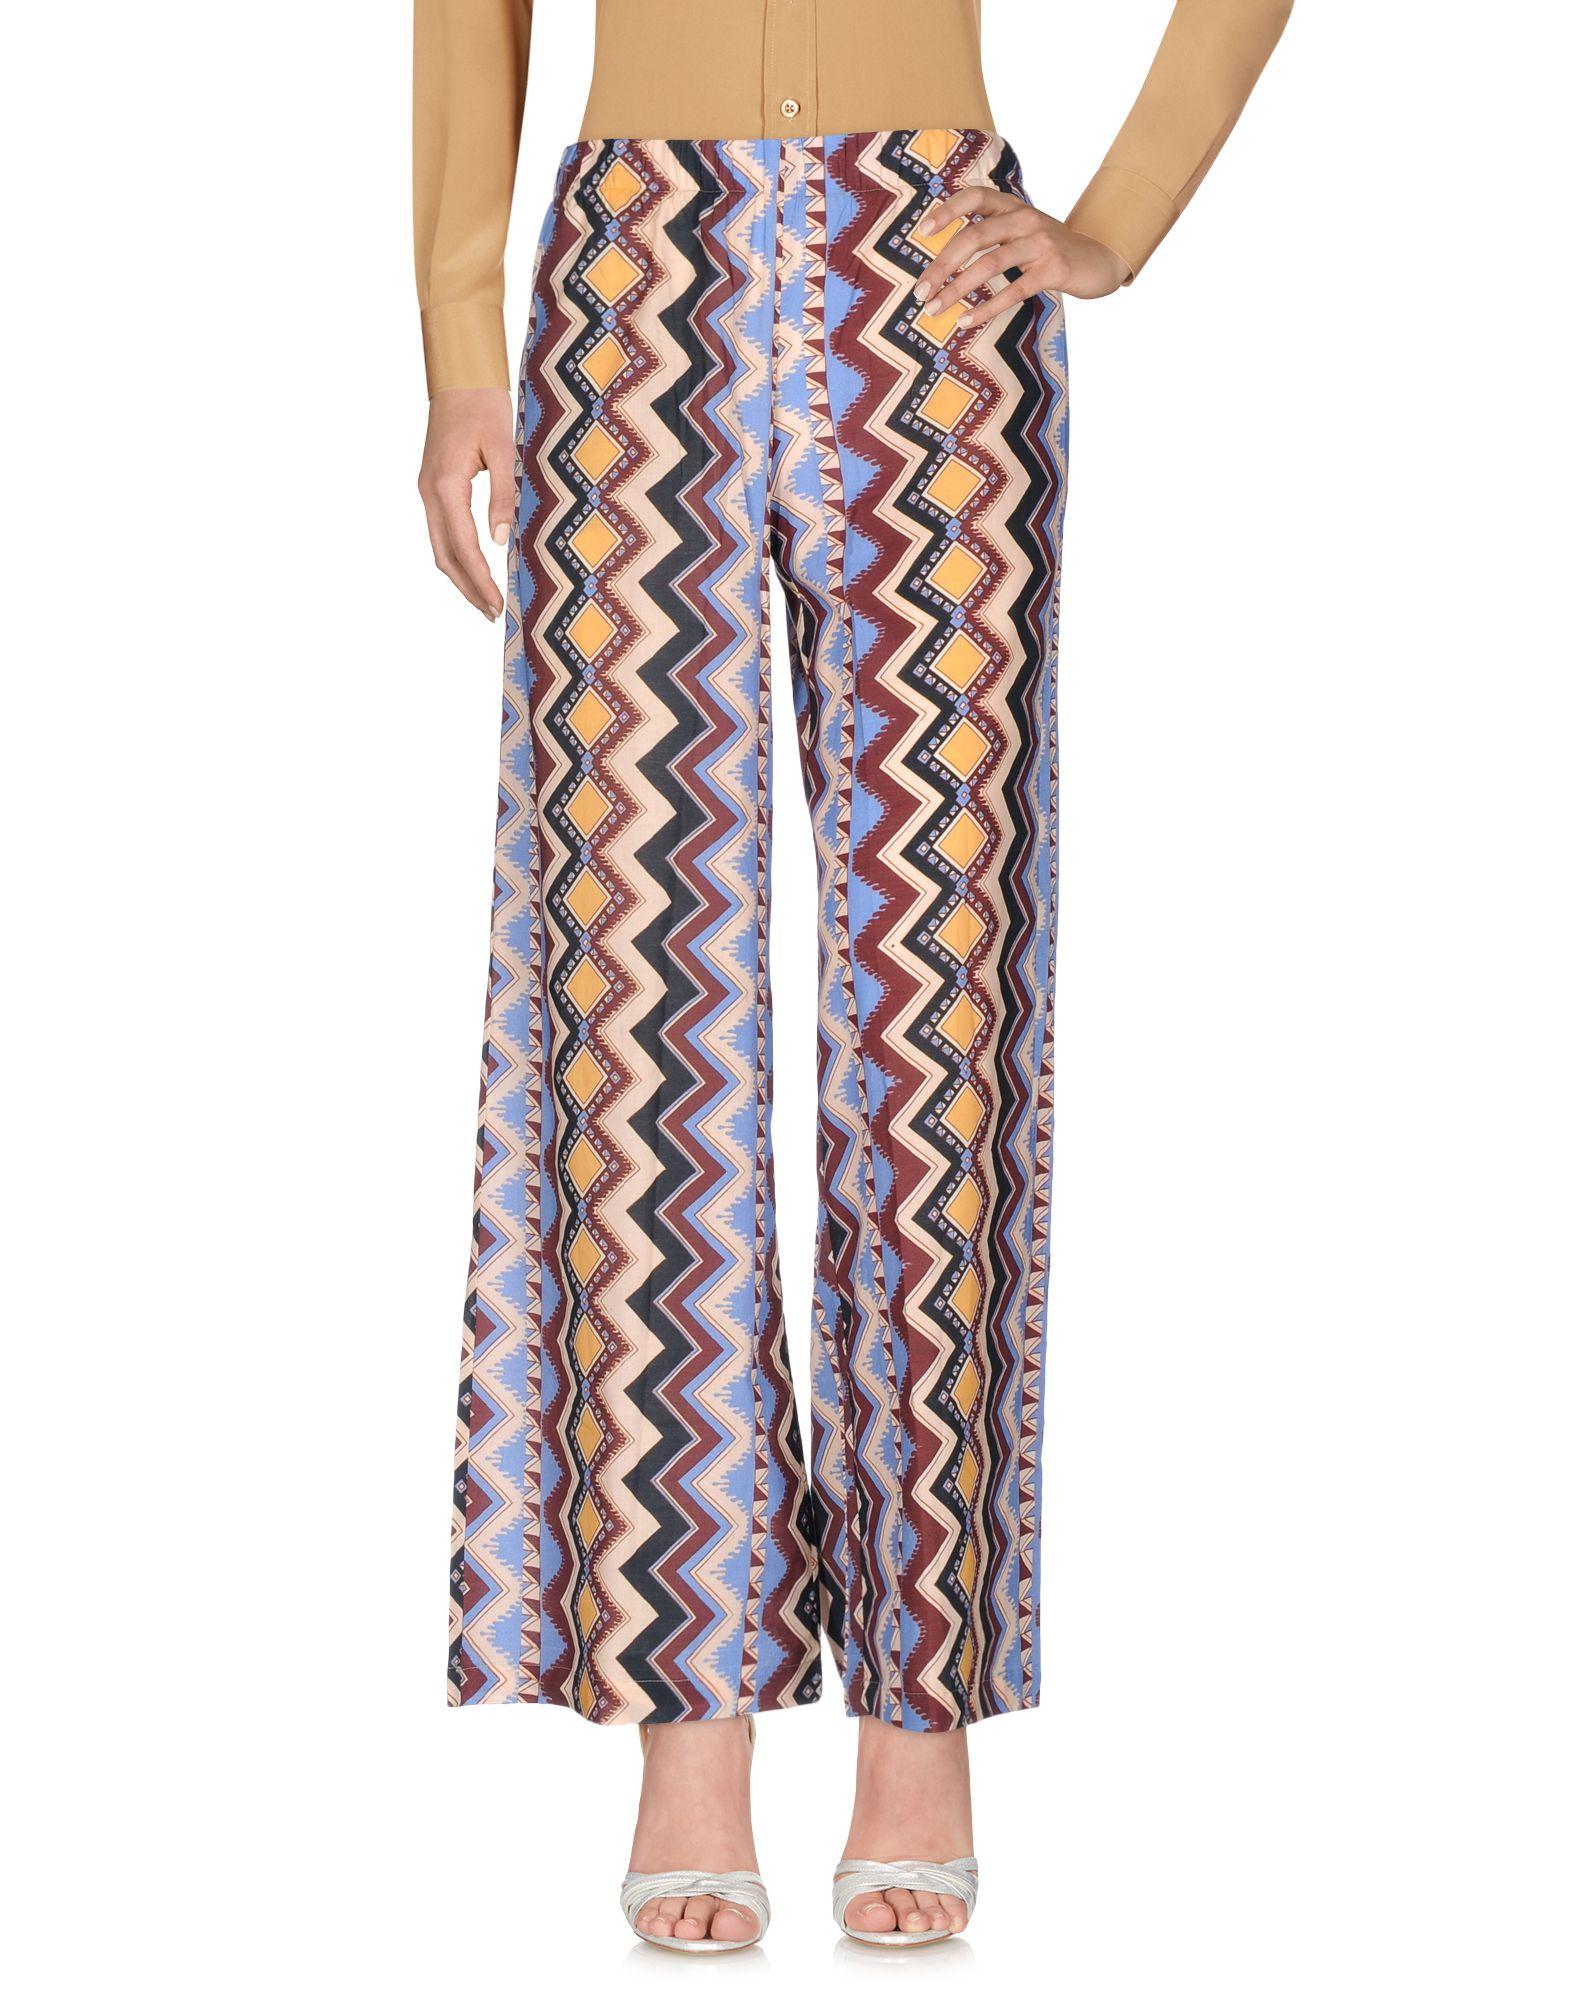 100X200 CENTOXDUECENTO Брюки-капри 100x200 centoxduecento пляжное платье